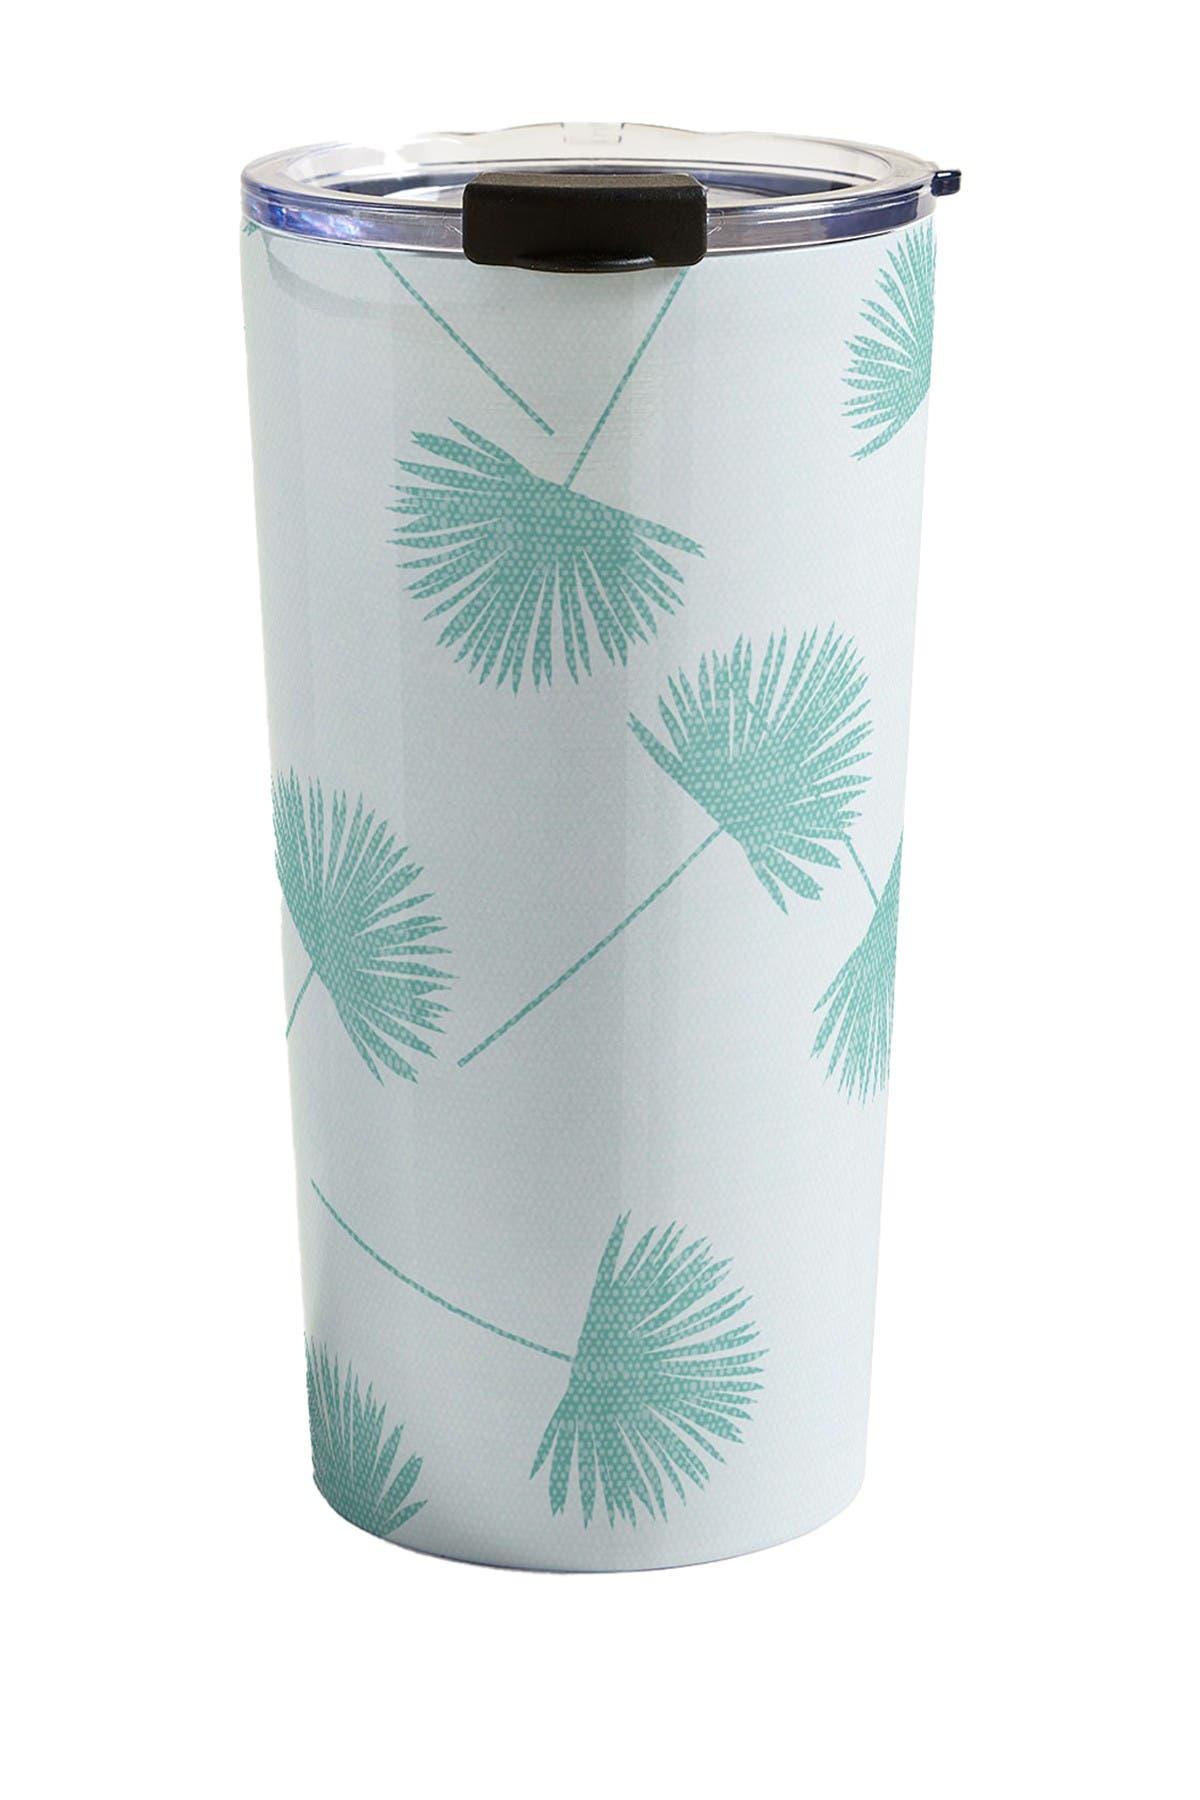 Image of Deny Designs Little Arrow Design Co Woven Fan Palm in Teal Travel Mug